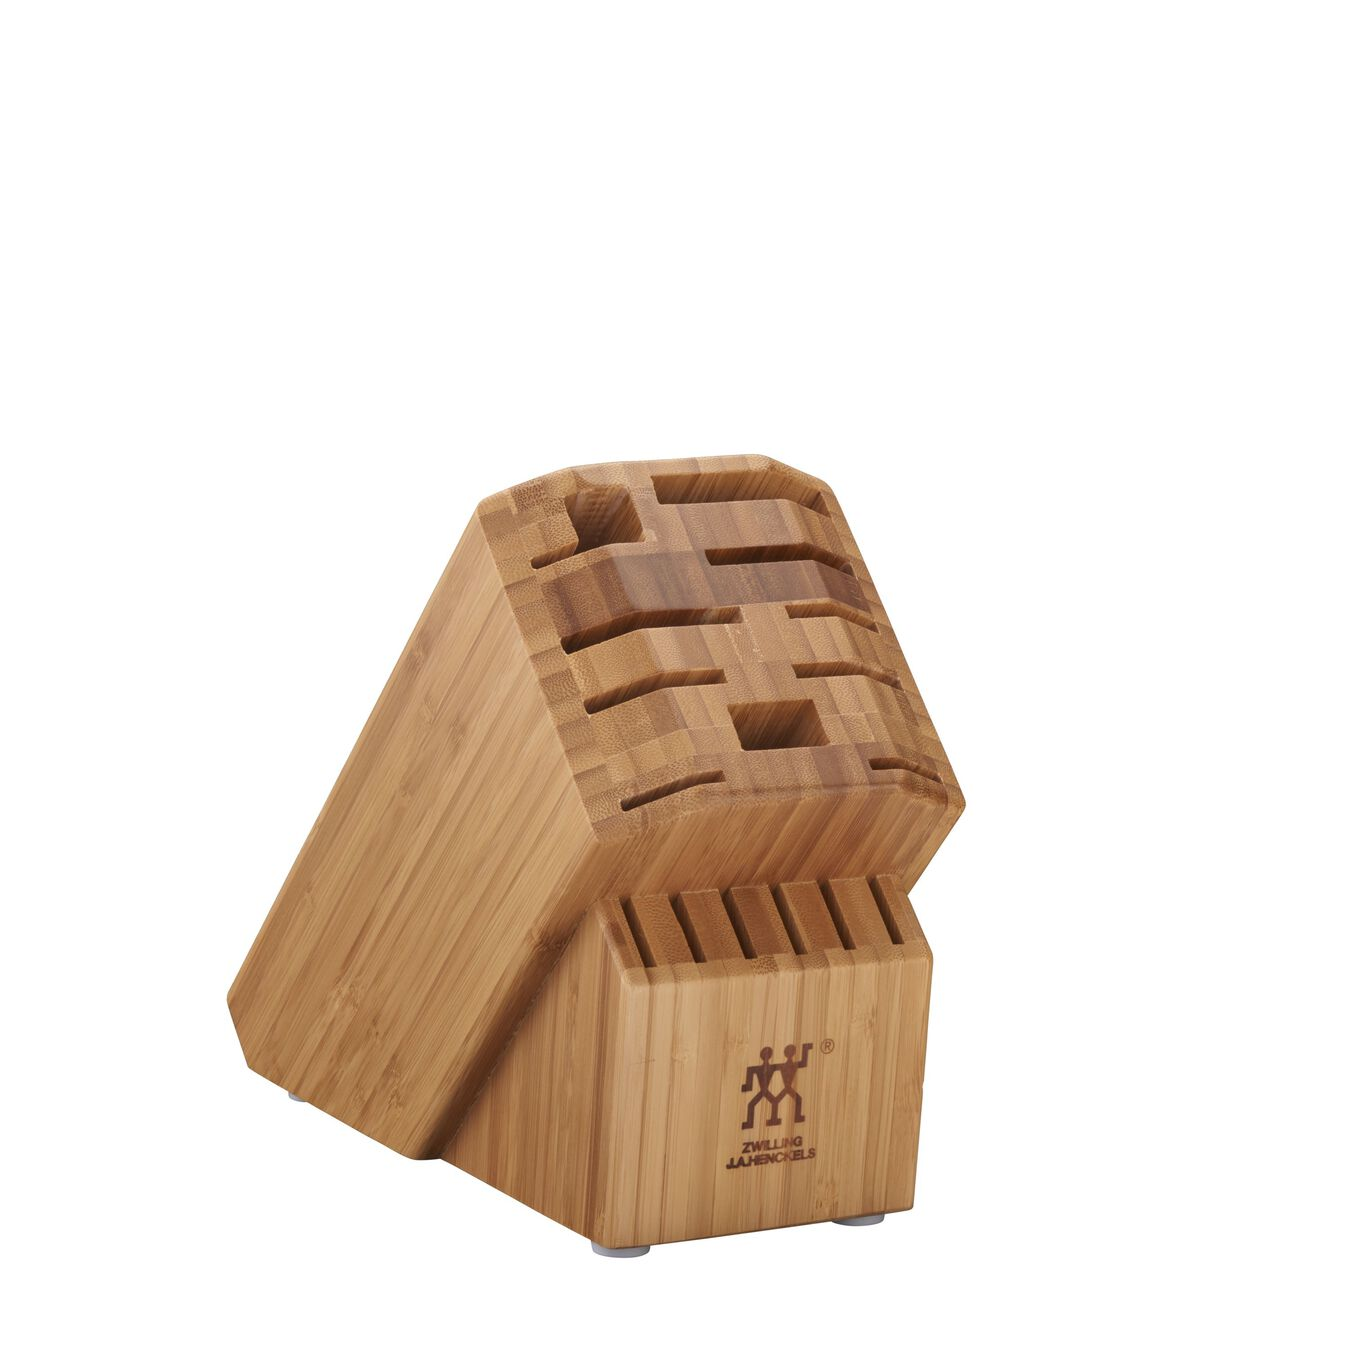 Bamboo 16-slot block,,large 1